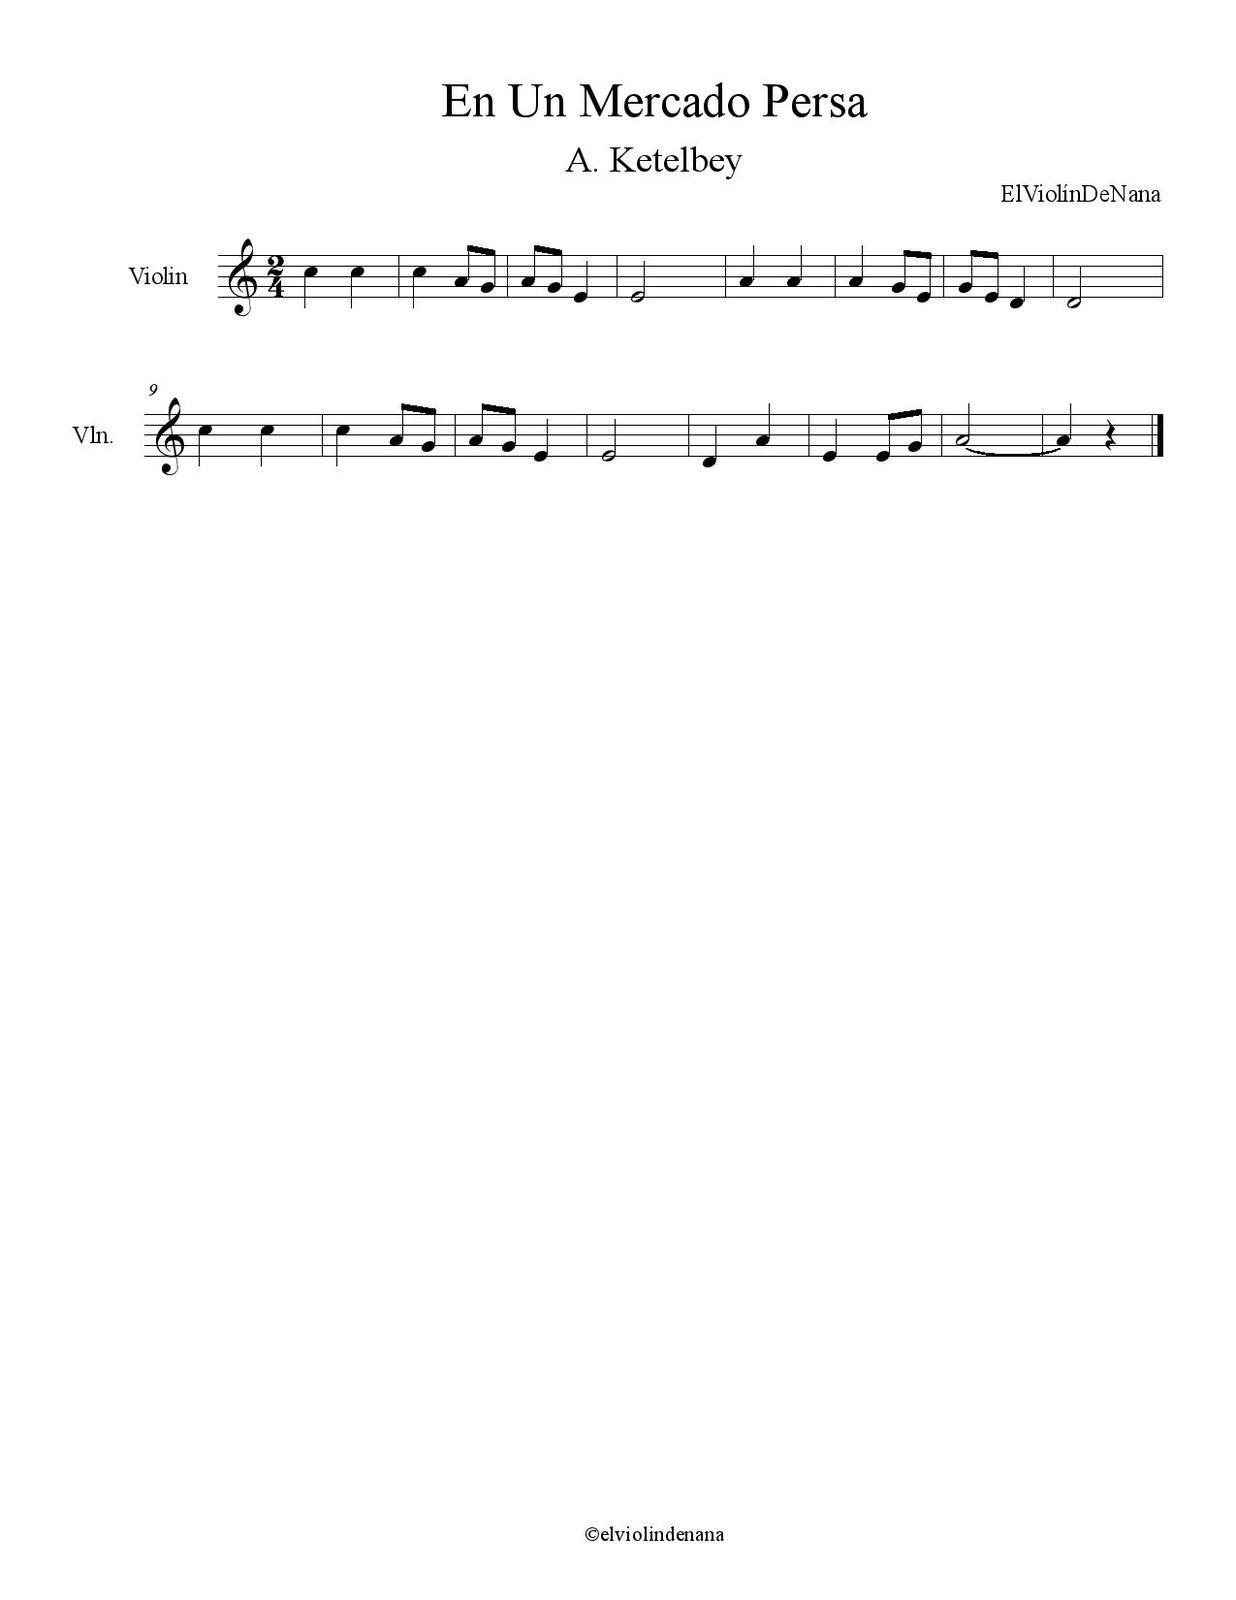 Partitura de la Canción &quot&#x3B;En Un Mercado Persa&quot&#x3B; | A. Ketelbey